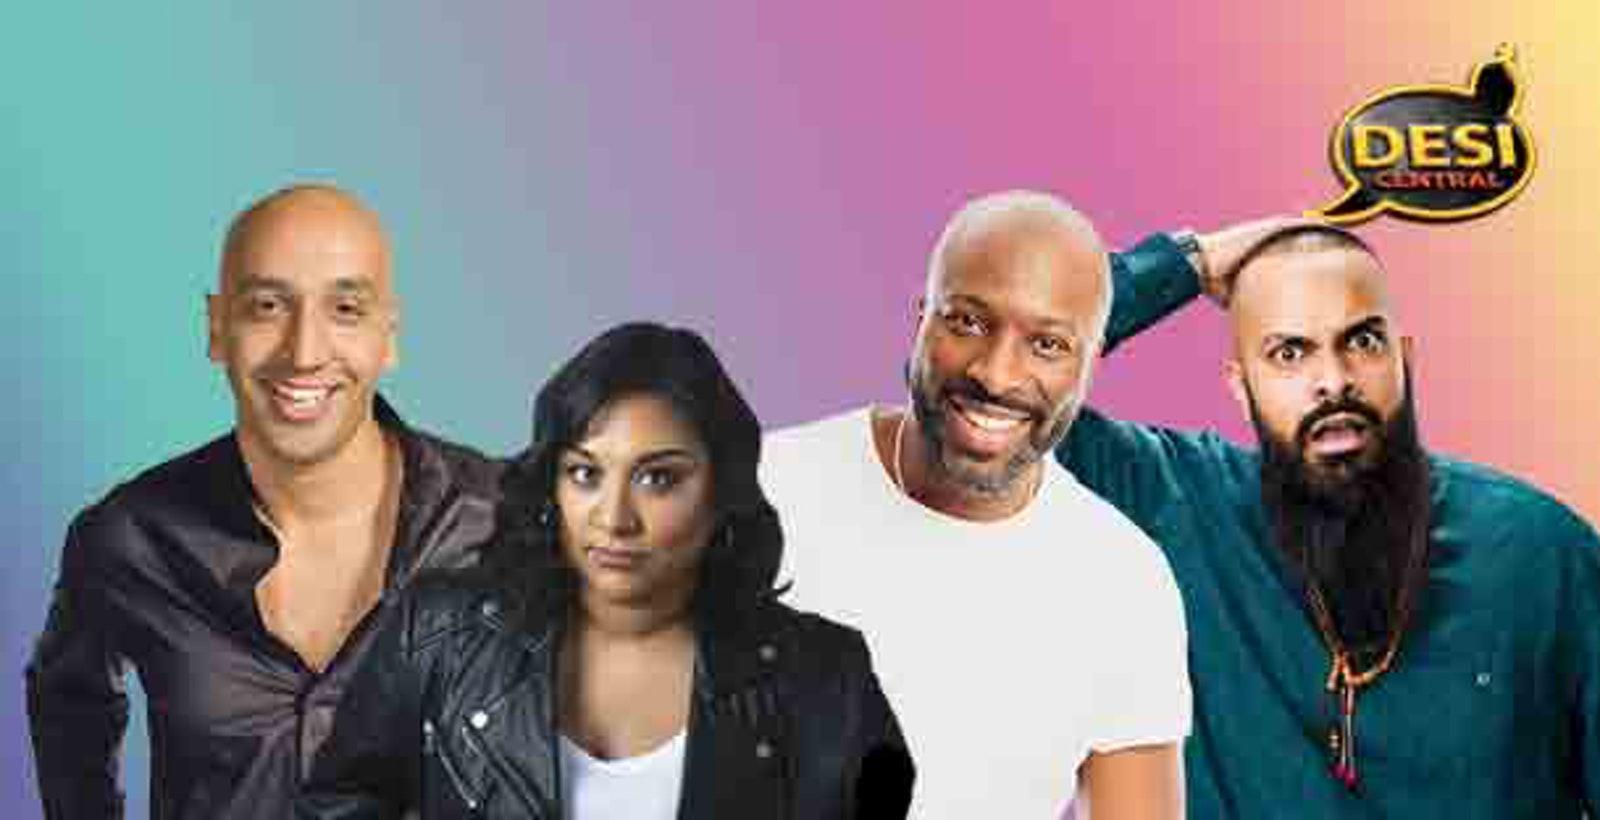 Desi Central Comedy Show – Coventry